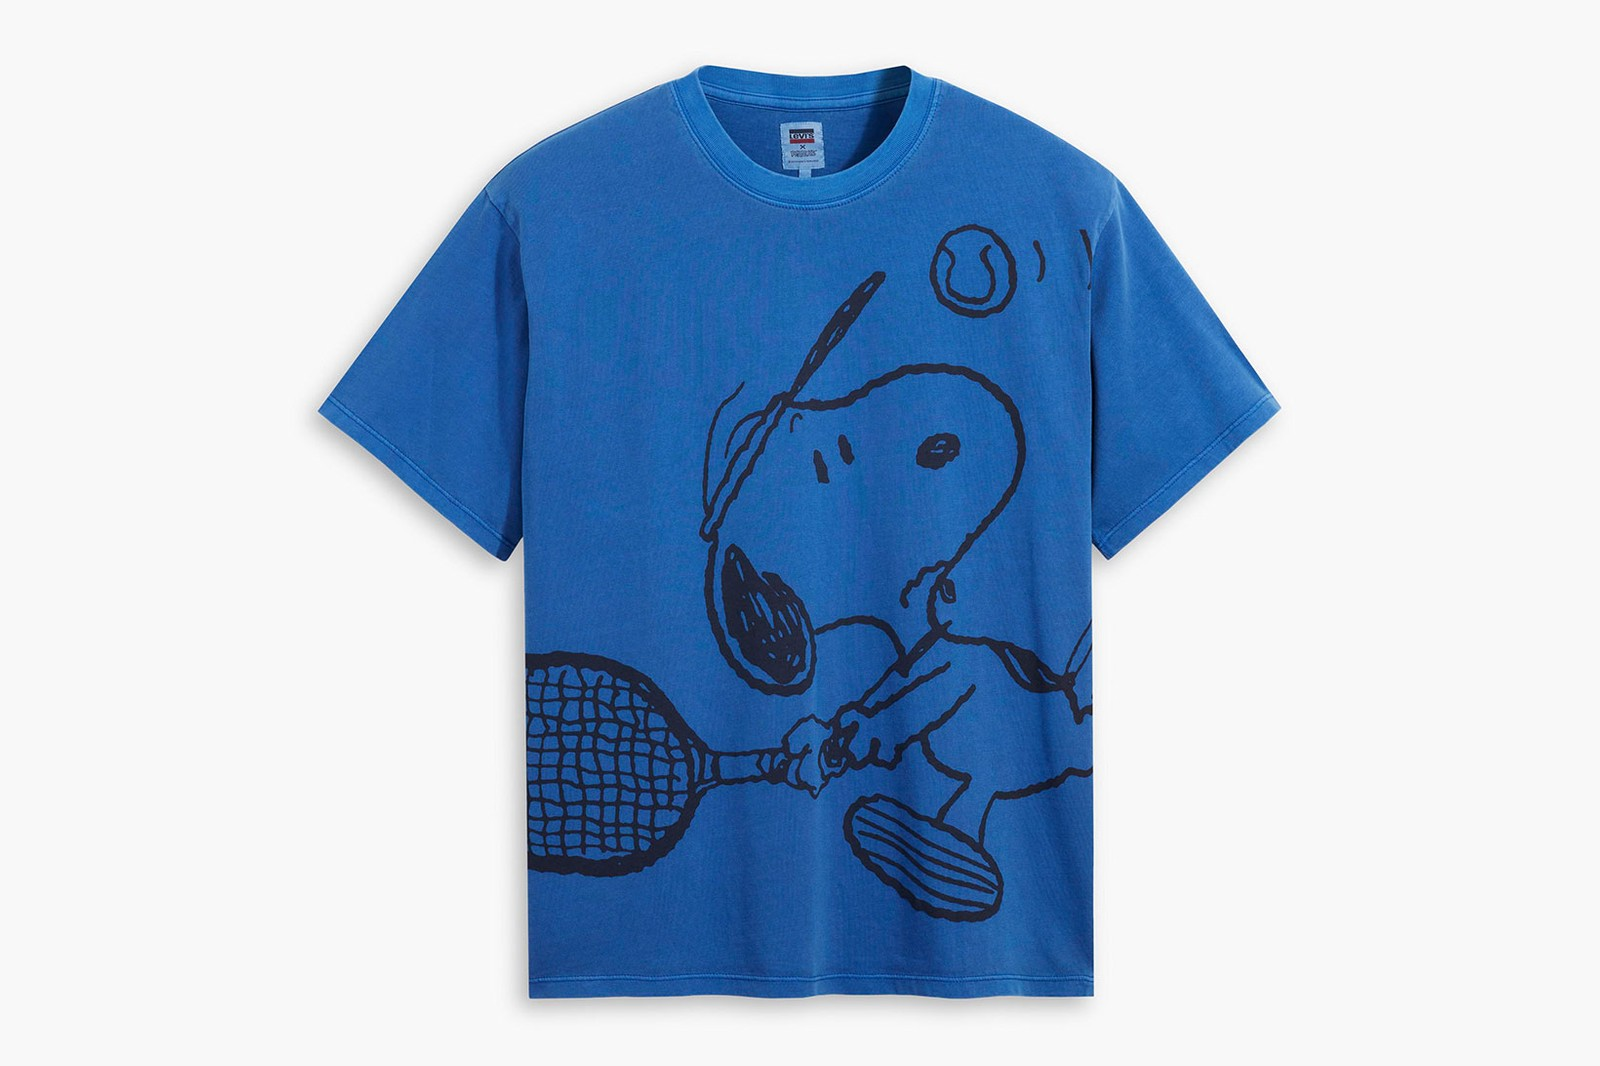 peanuts levis summer collaboration snoopy charlie brown sweatshirts bucket hats